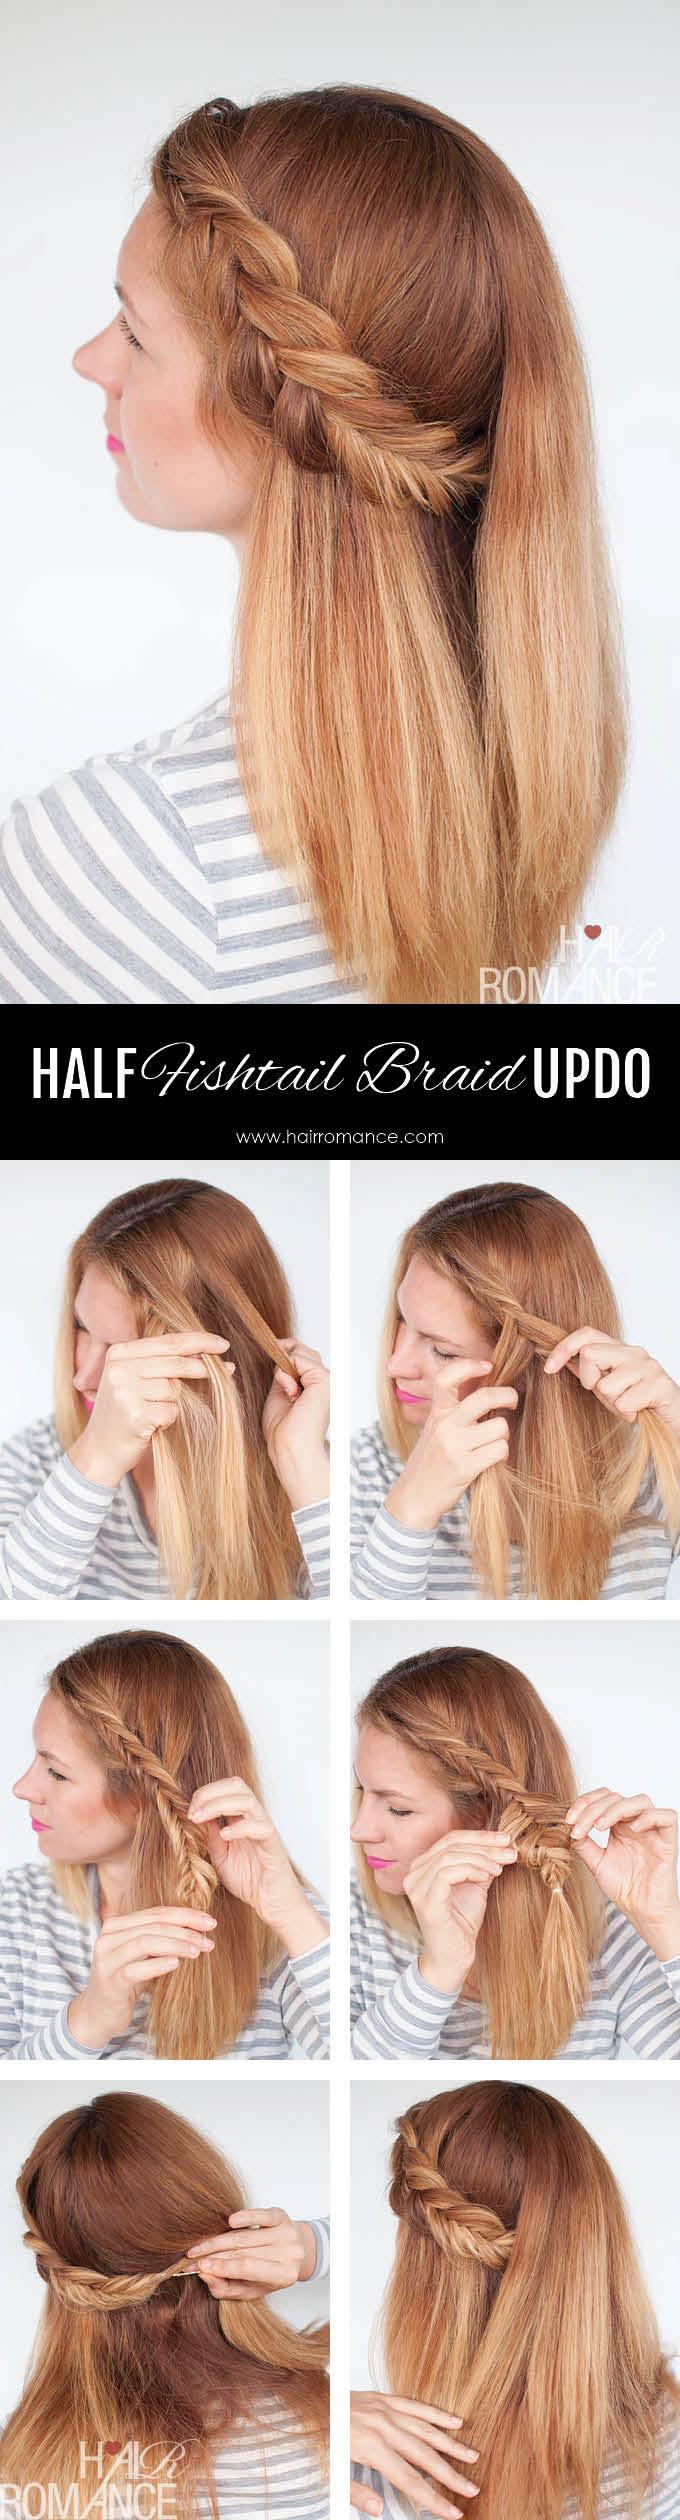 Reverse fishtail braid tutorial - two ways Fishtail Braid How To